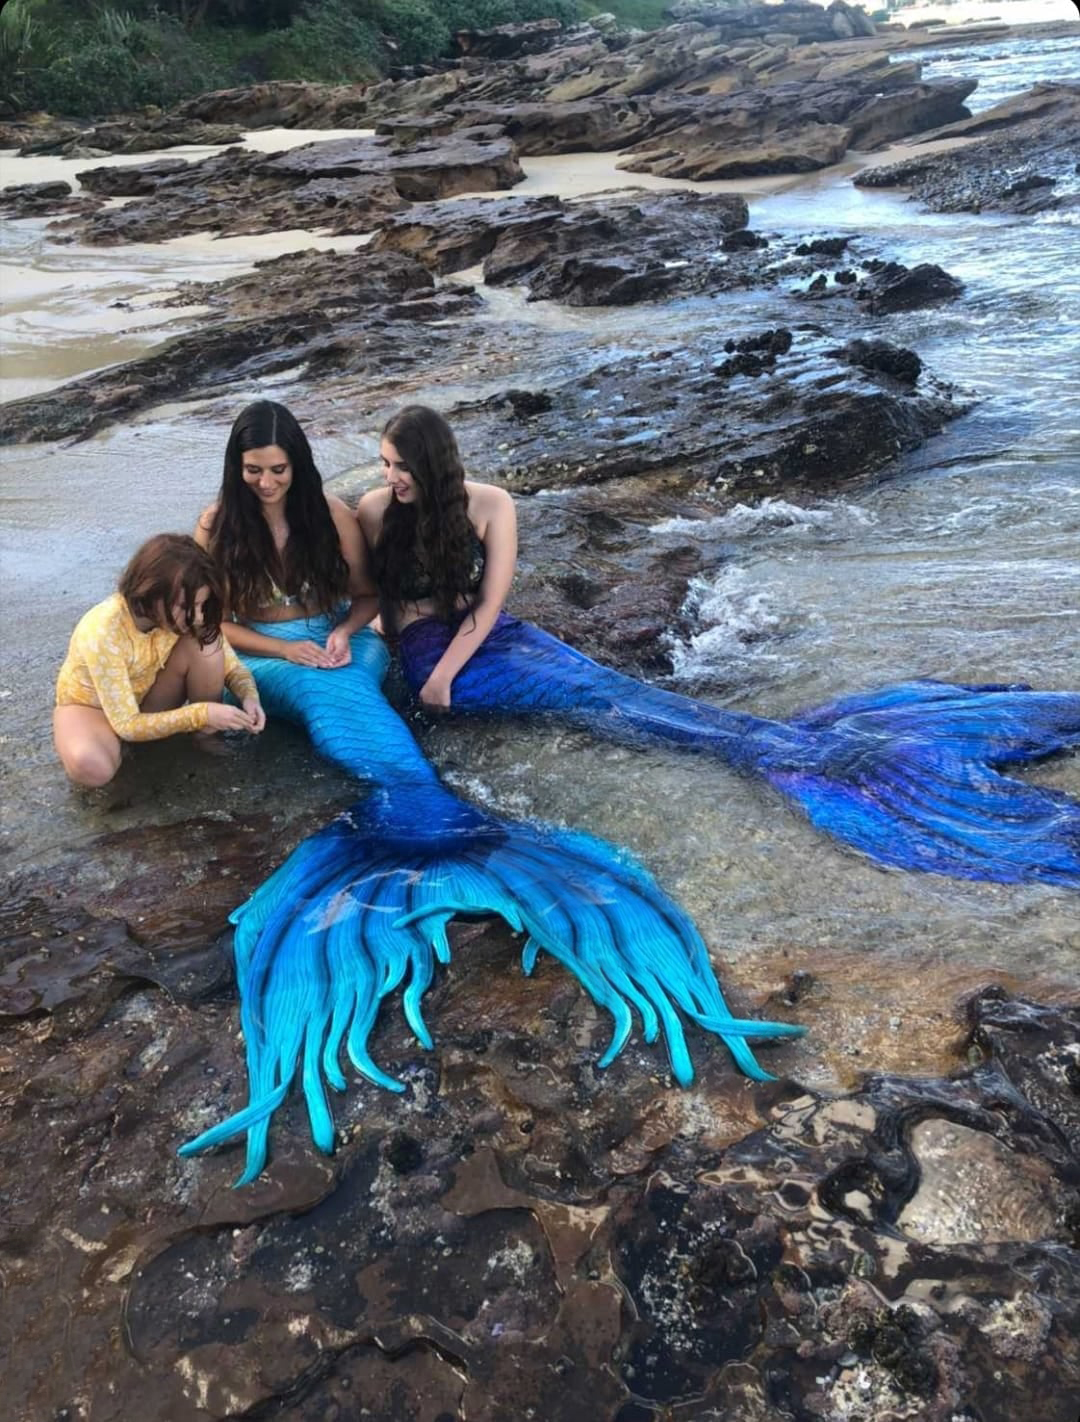 Mermaids for Hire Sydney Australia